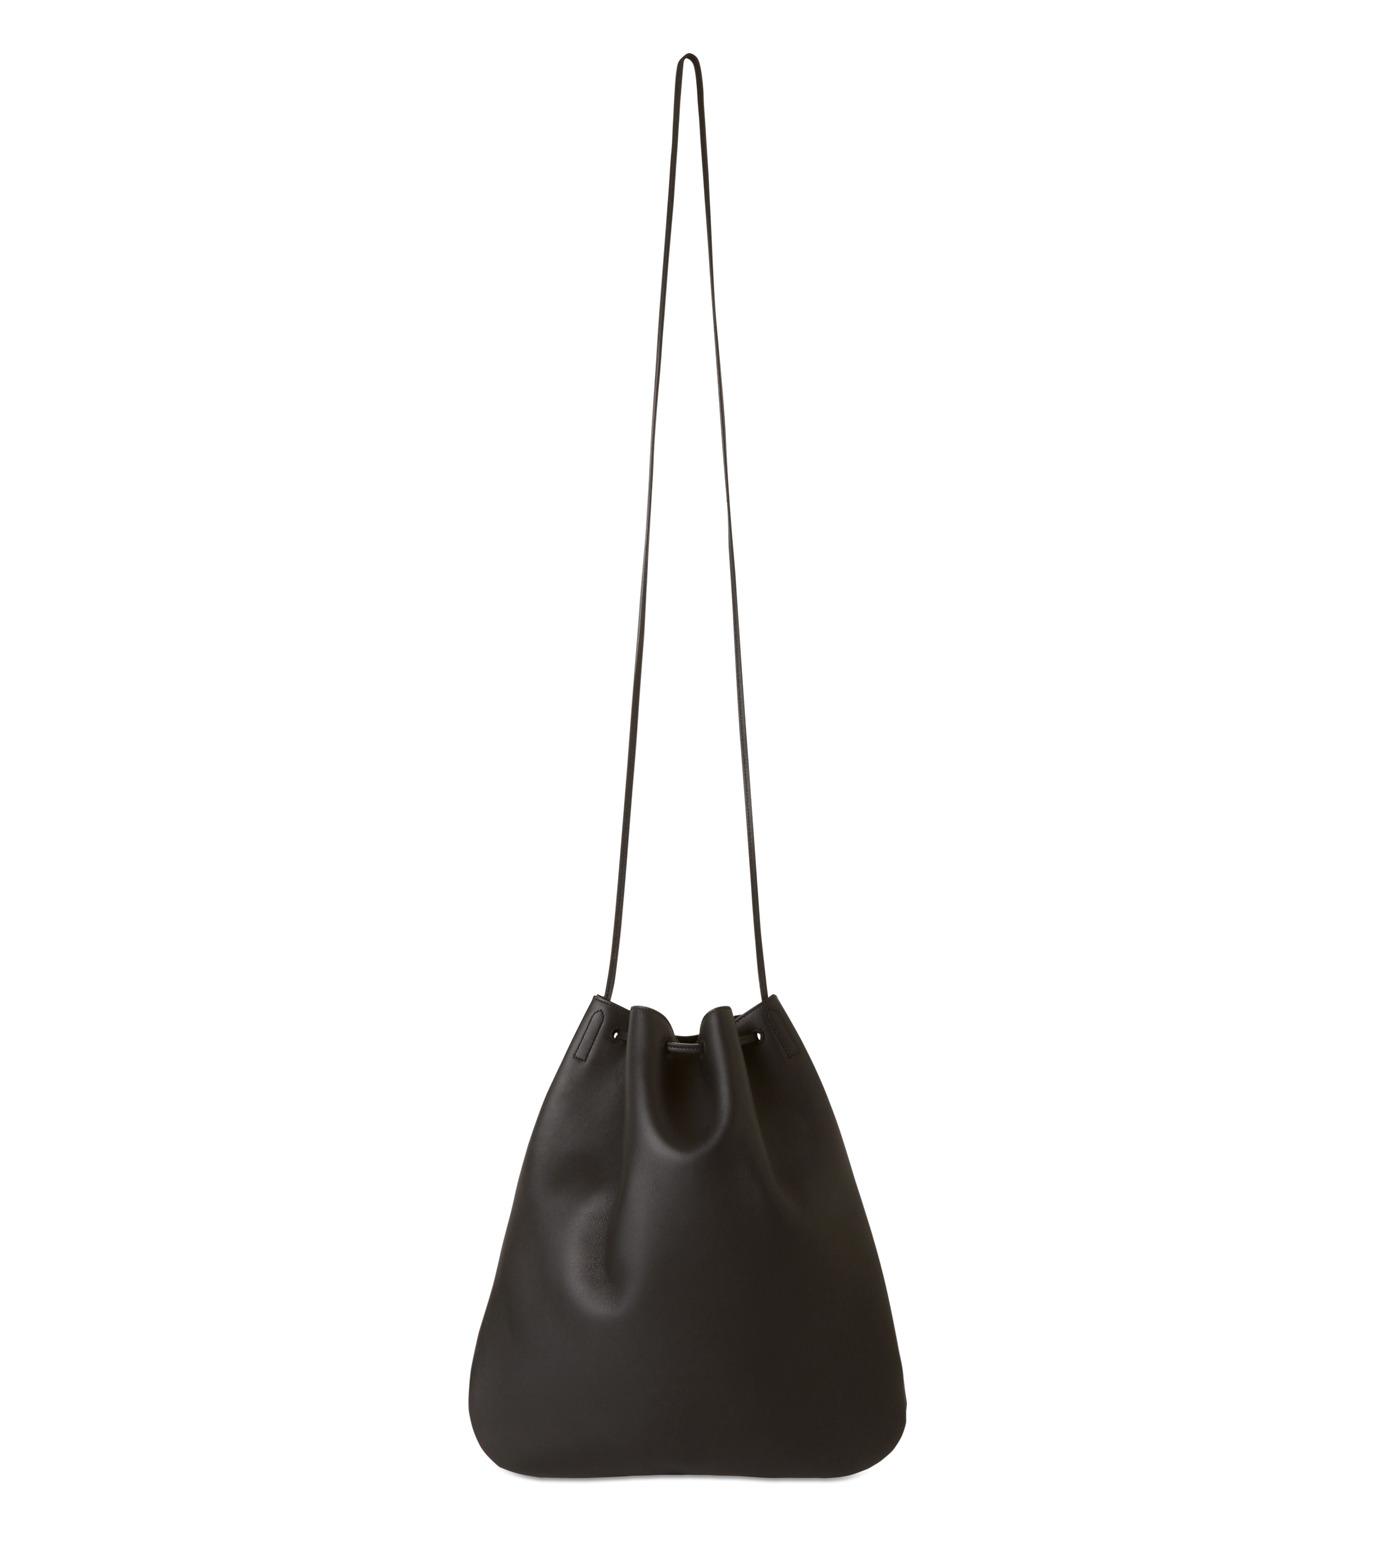 SAINT LAURENT(サンローラン)のJen Medium Flat Bag-BLACK(ショルダーバッグ/shoulder bag)-423874-BJ50D-13 拡大詳細画像3